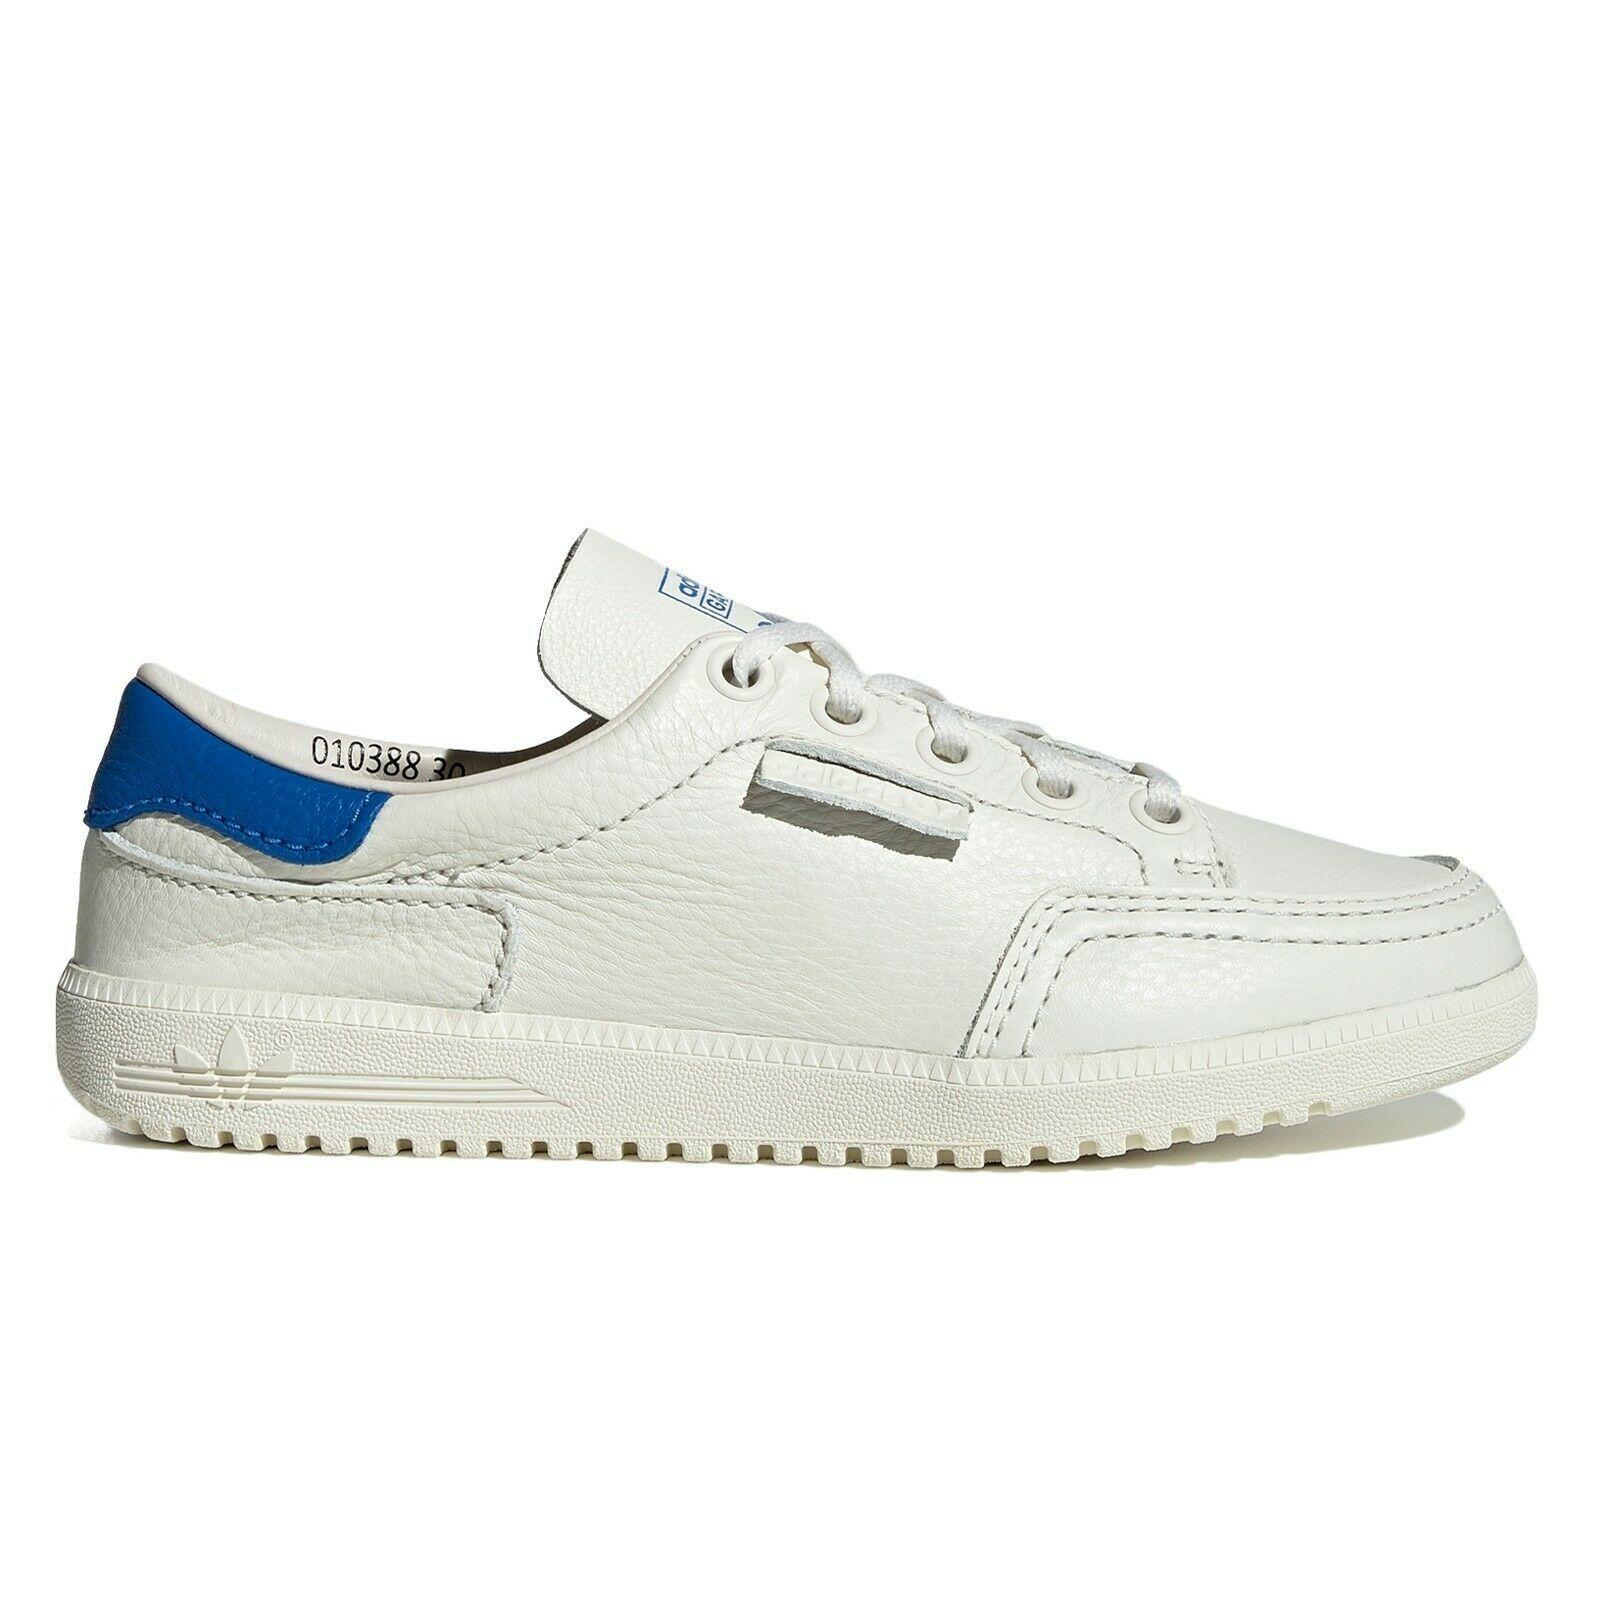 Adidas Originals Spezial Garwen x Union Leather B41825 Mens Sneakers